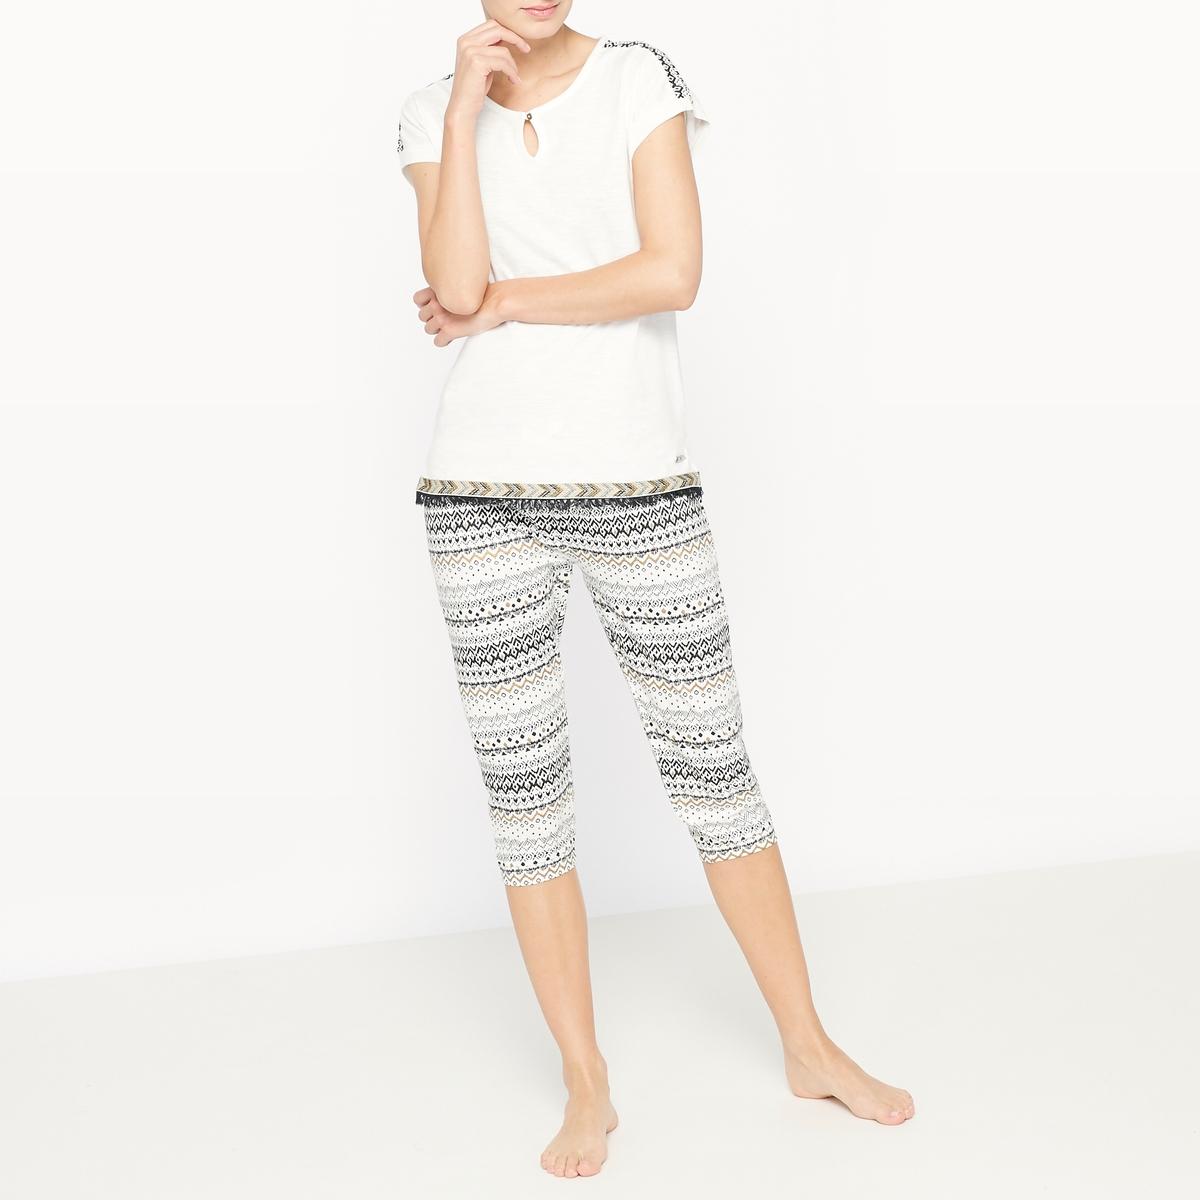 Пижама с короткими рукавами и короткими брюками из хлопка Galon